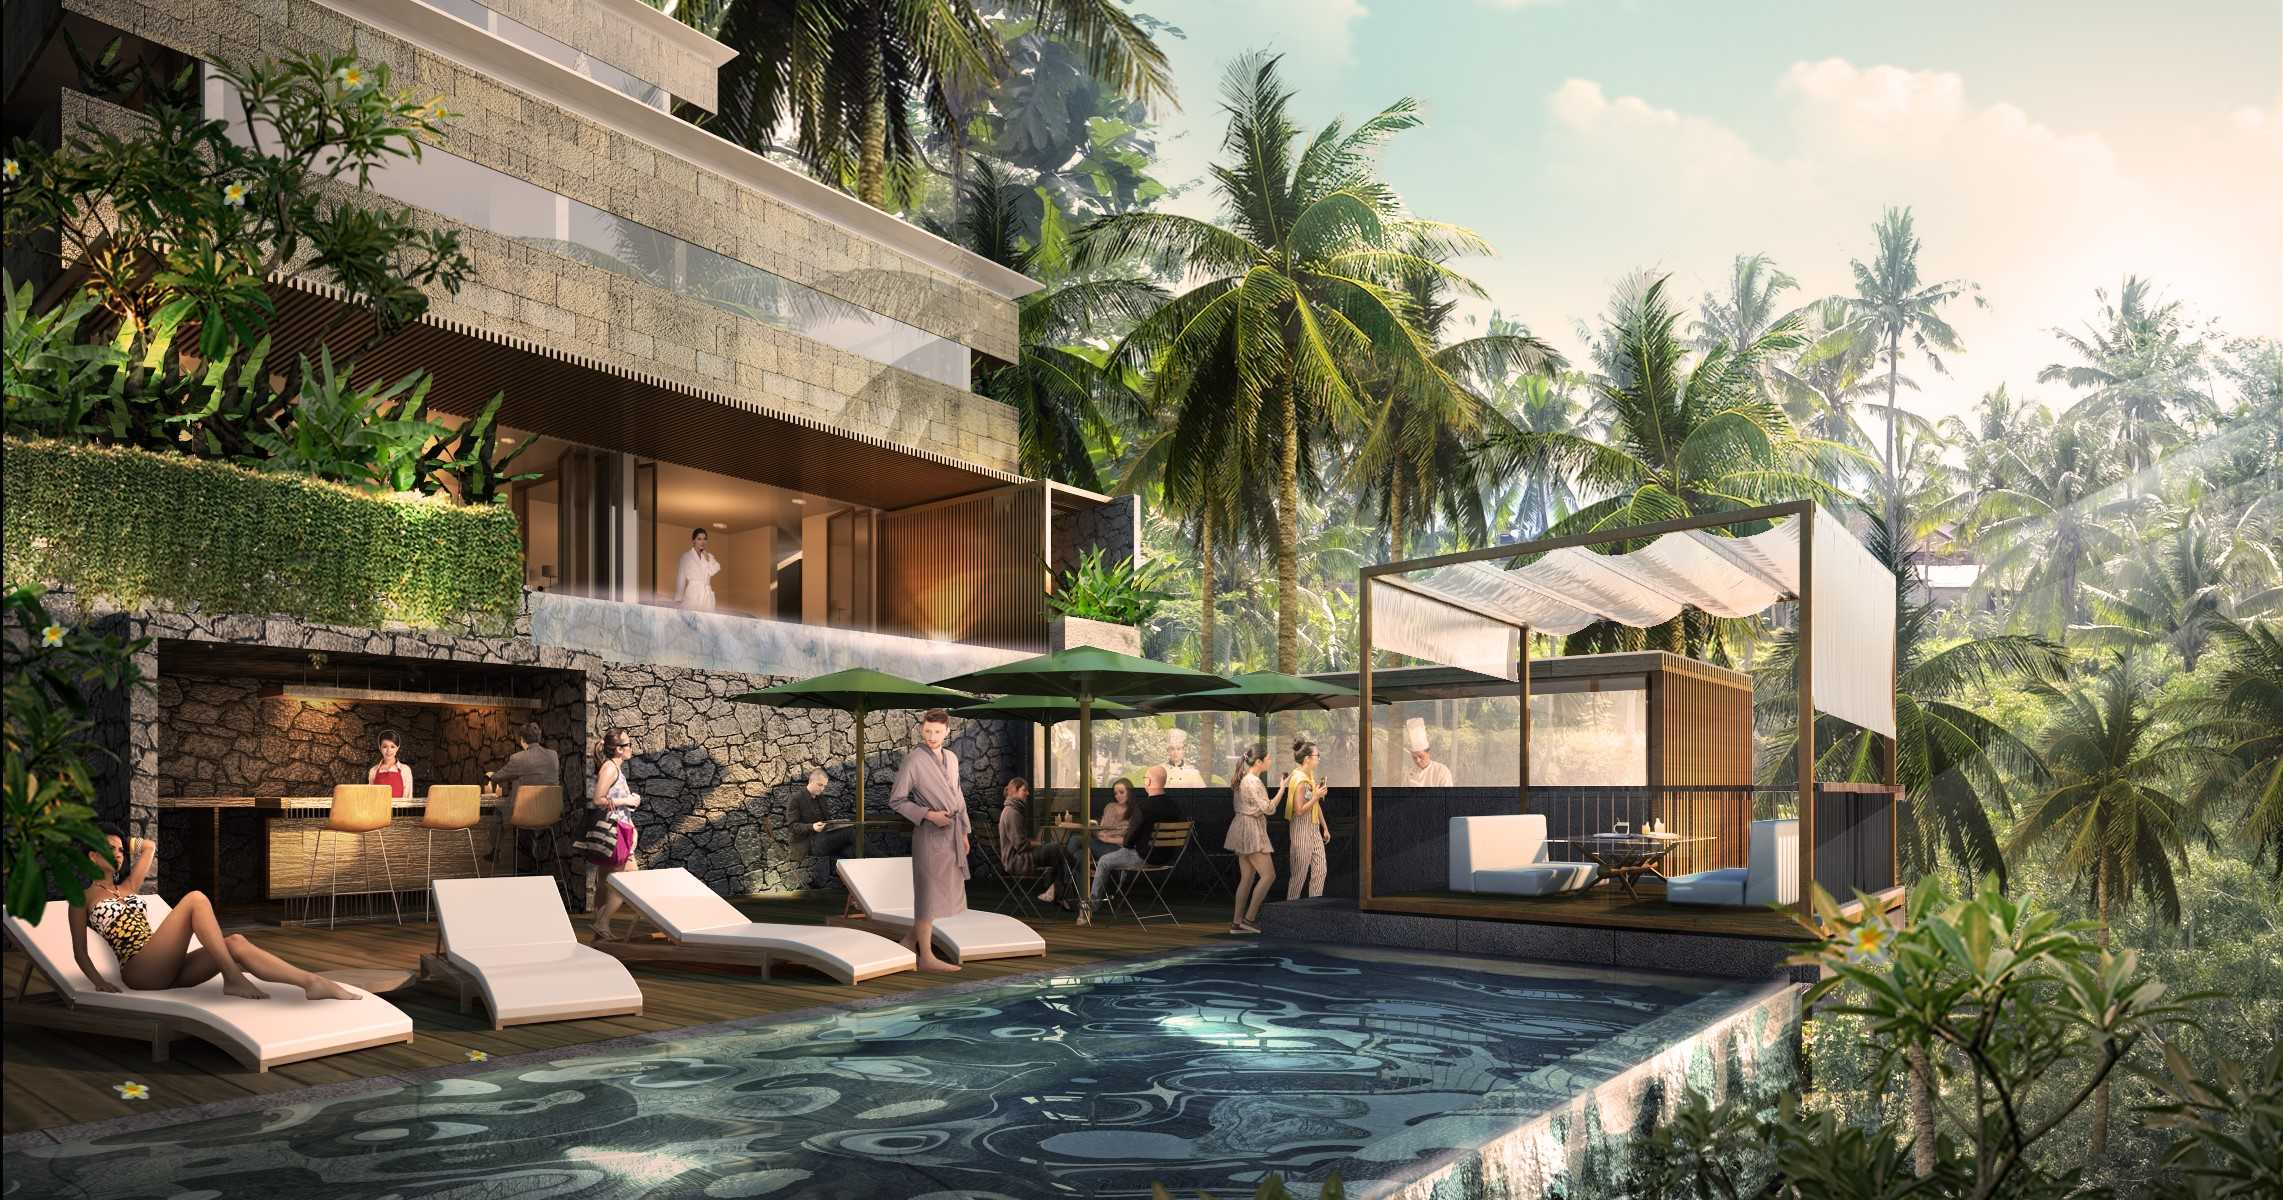 Ksad Dukuh Artvilla Ubud, Bali, Indonesia Ubud, Bali, Indonesia Swimming Pool Tropis  10226